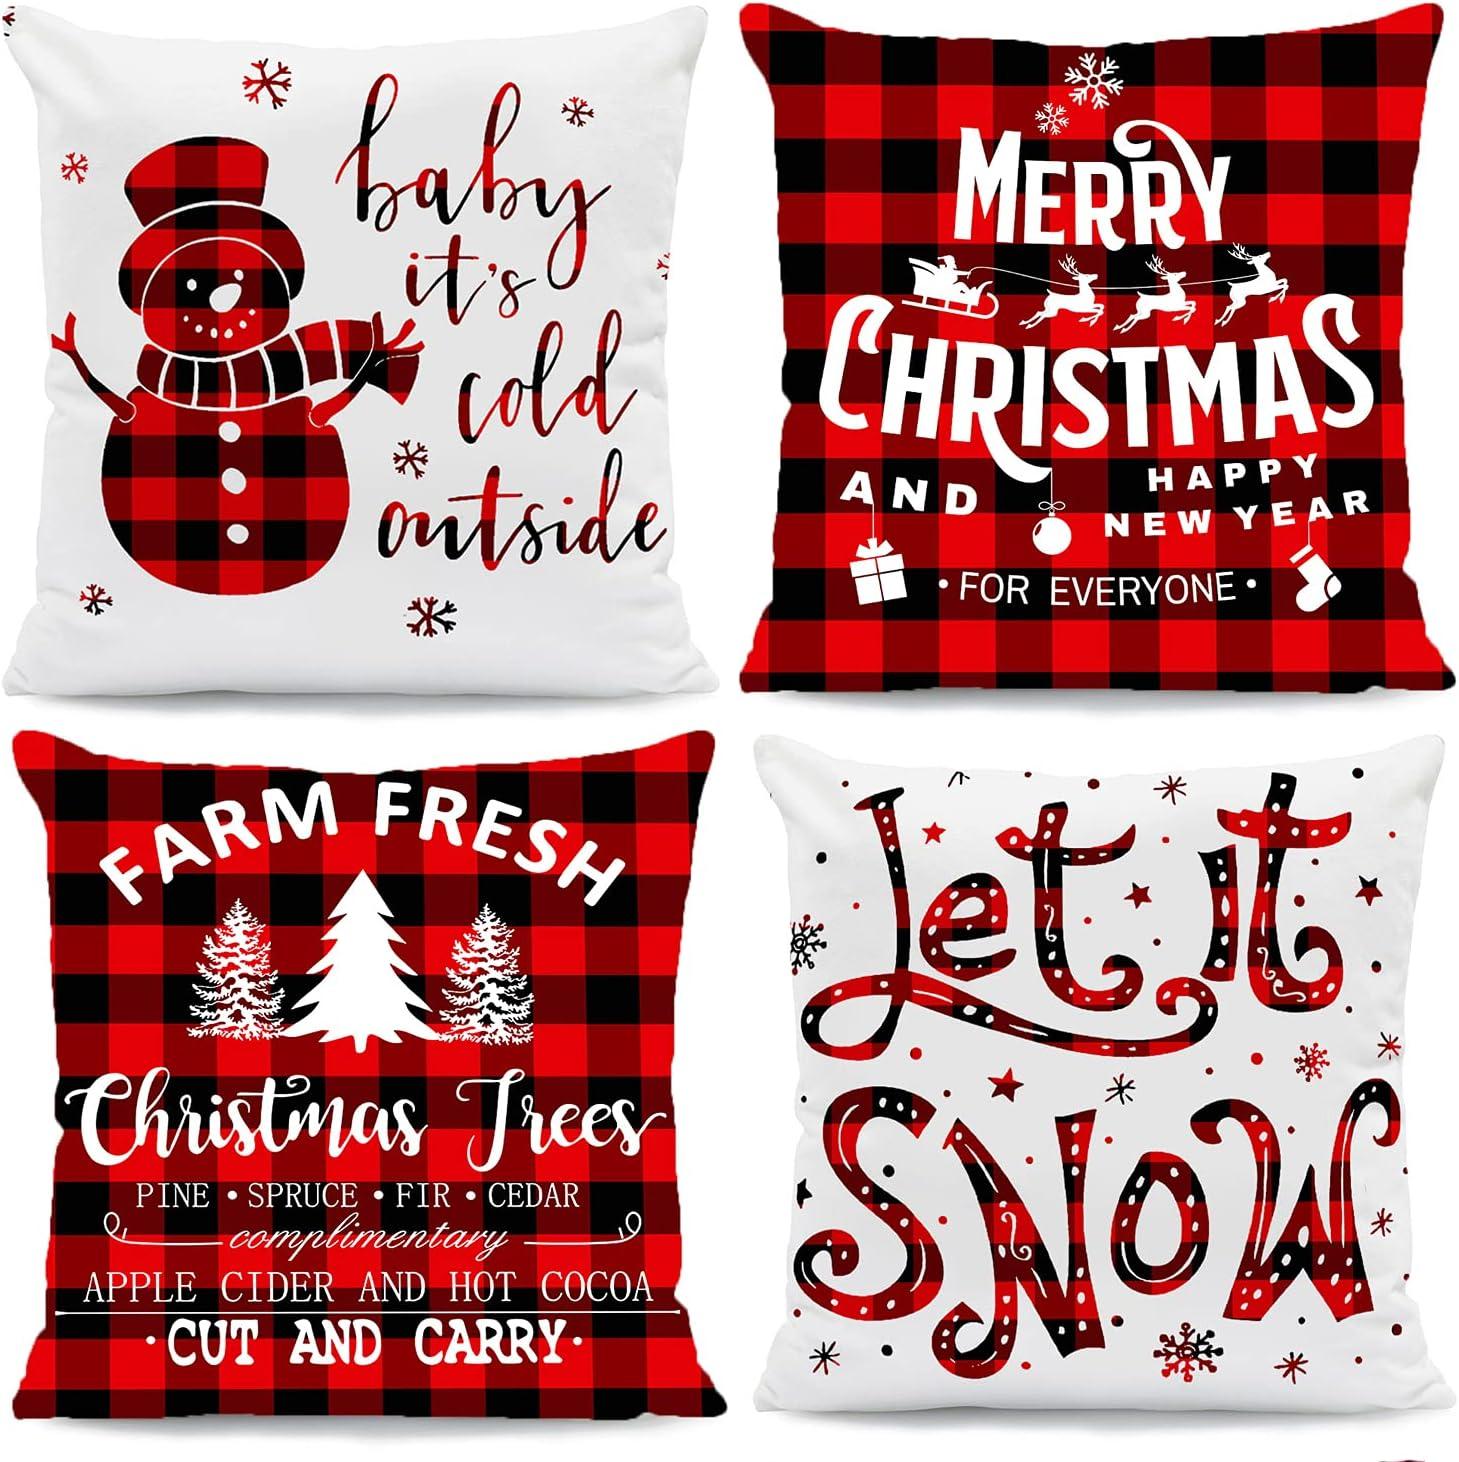 4Pcs Christmas Throw Pillow Covers, Buffalo Plaid Soft Christmas Pillowcases Xmas Winter Holiday Cushin Covers for Home, Sofa, Christmas Decor Throw Pillow Covers-18x18''